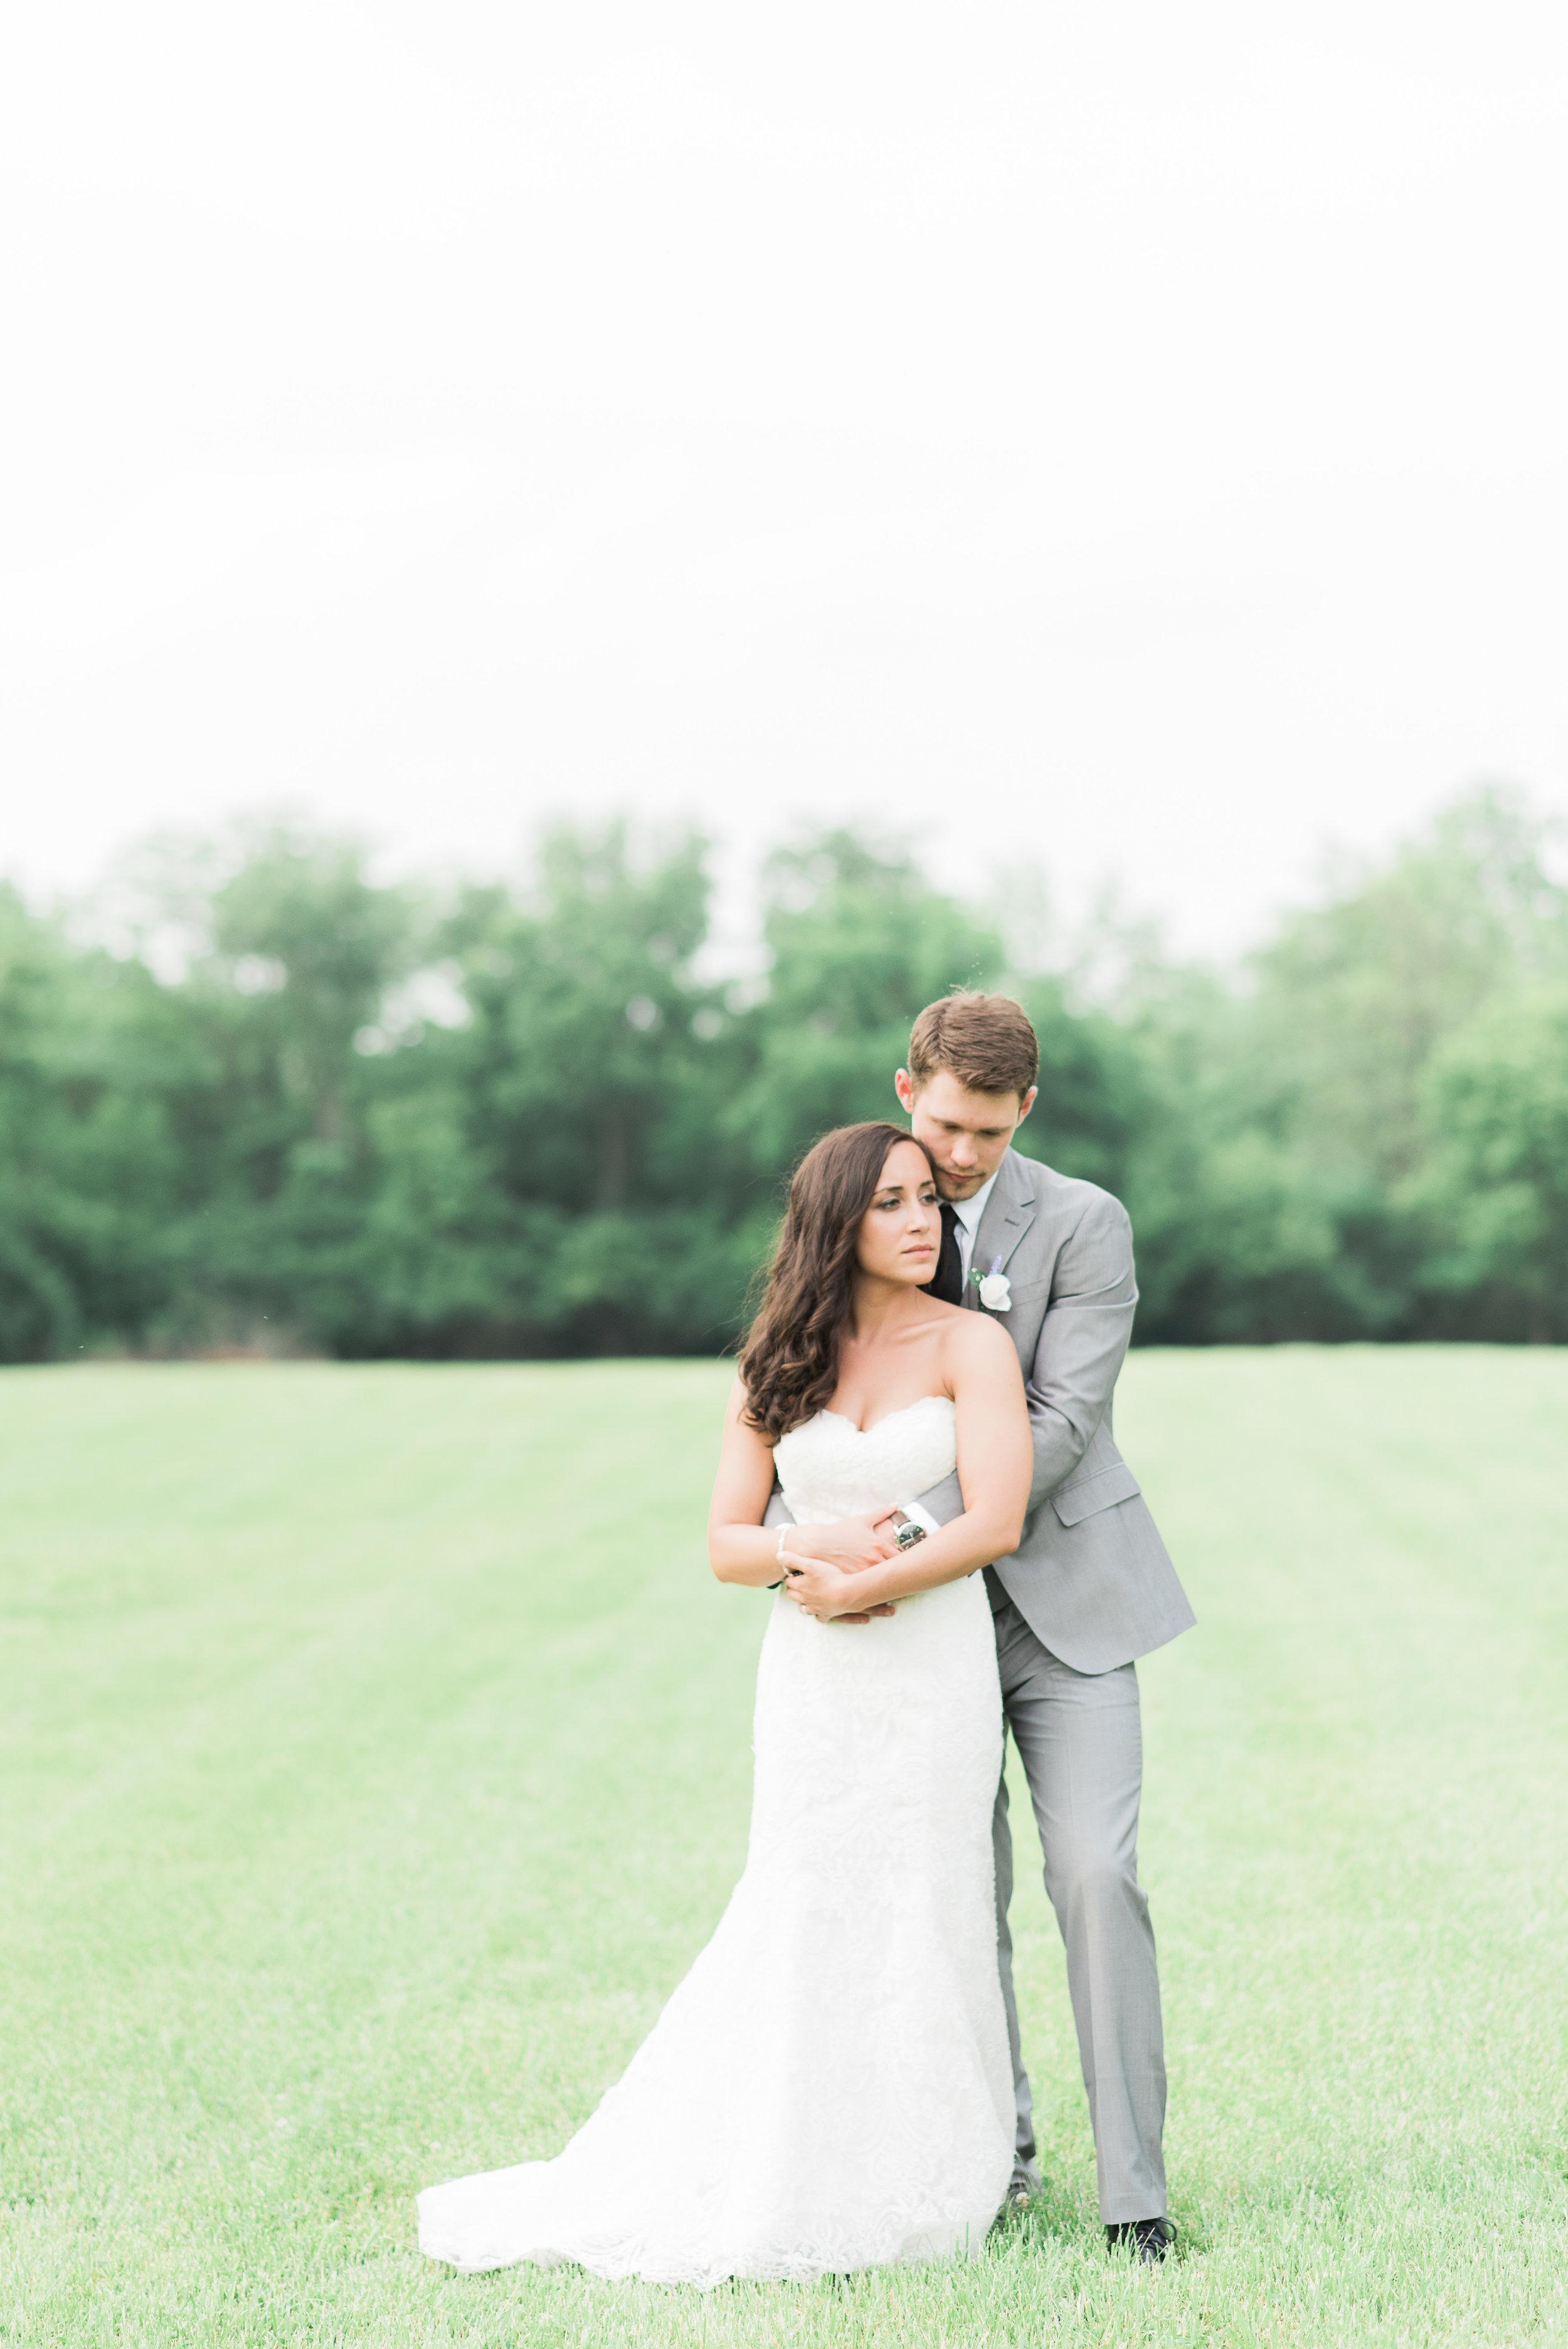 Favorites-2017-05-20 Sarah Marcus Wedding13333-110 copy.jpg